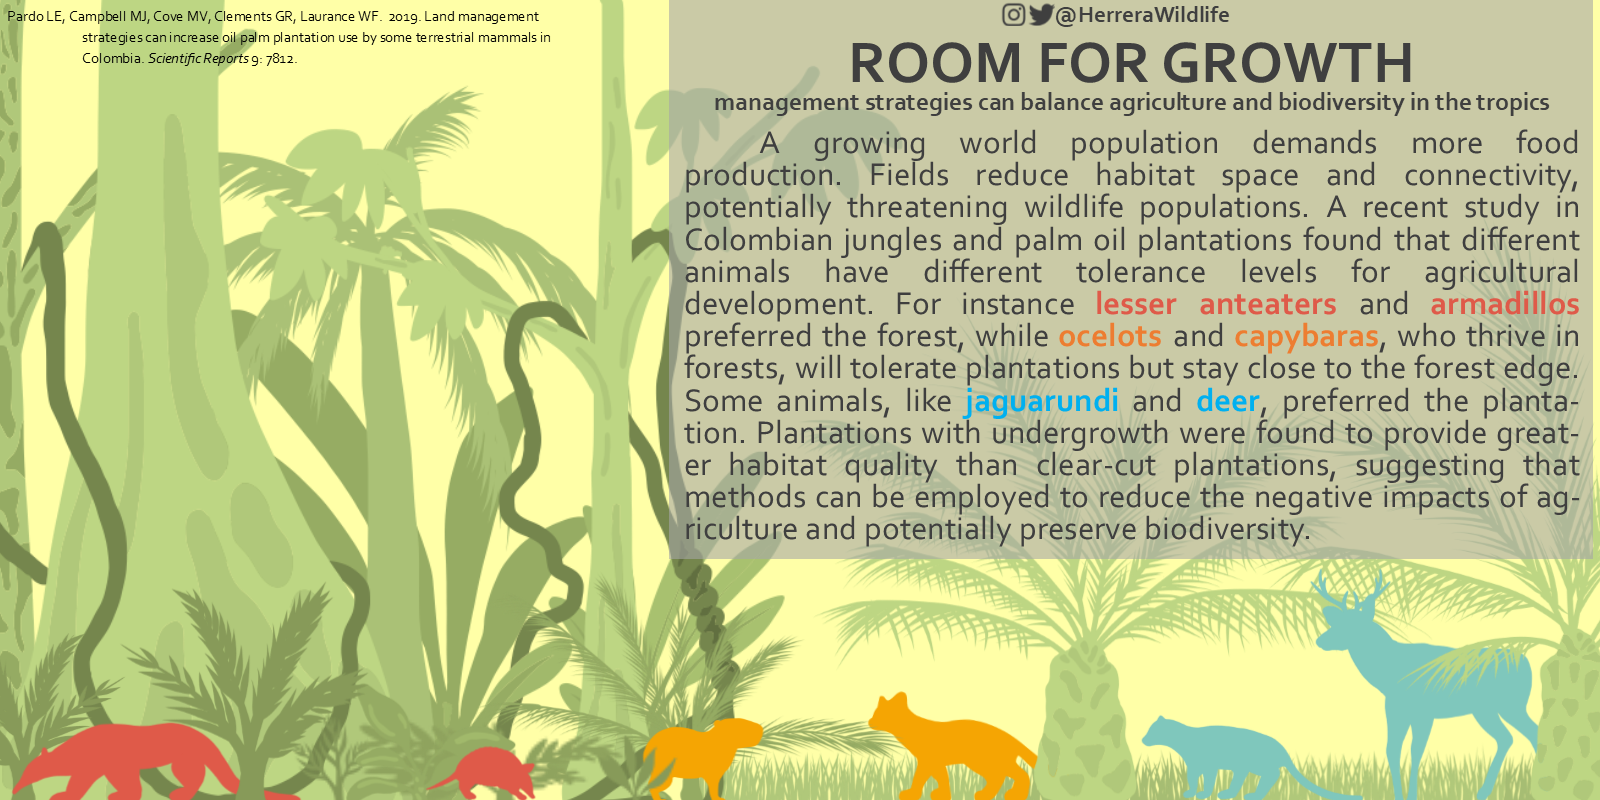 Herrera Wildlife - Palm Oil